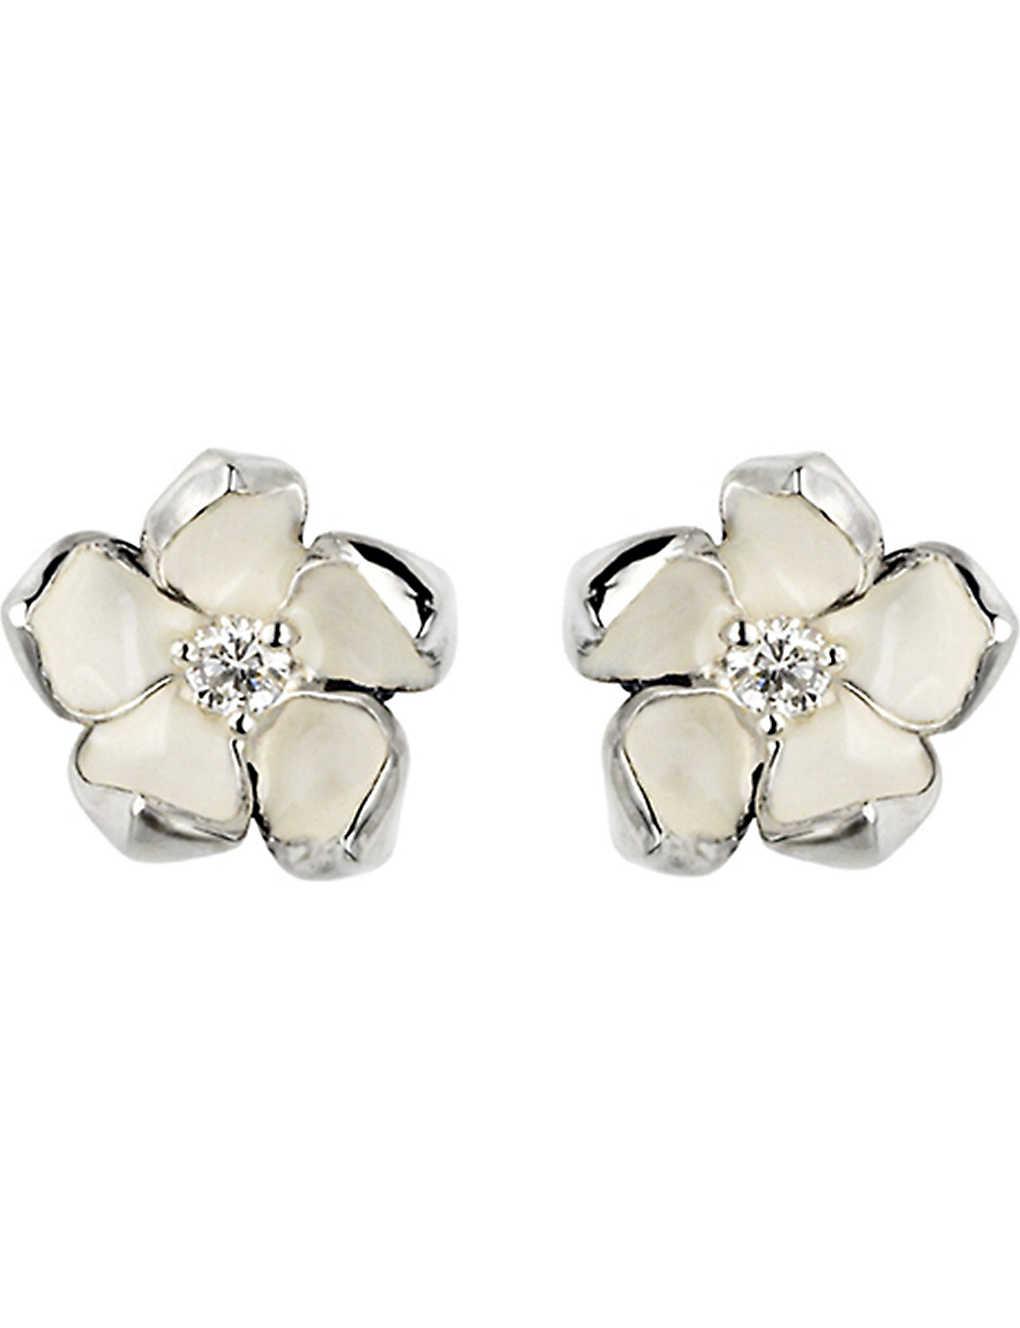 6d24edcc8 SHAUN LEANE - Cherry Blossom silver, ivory enamel and diamond stud ...